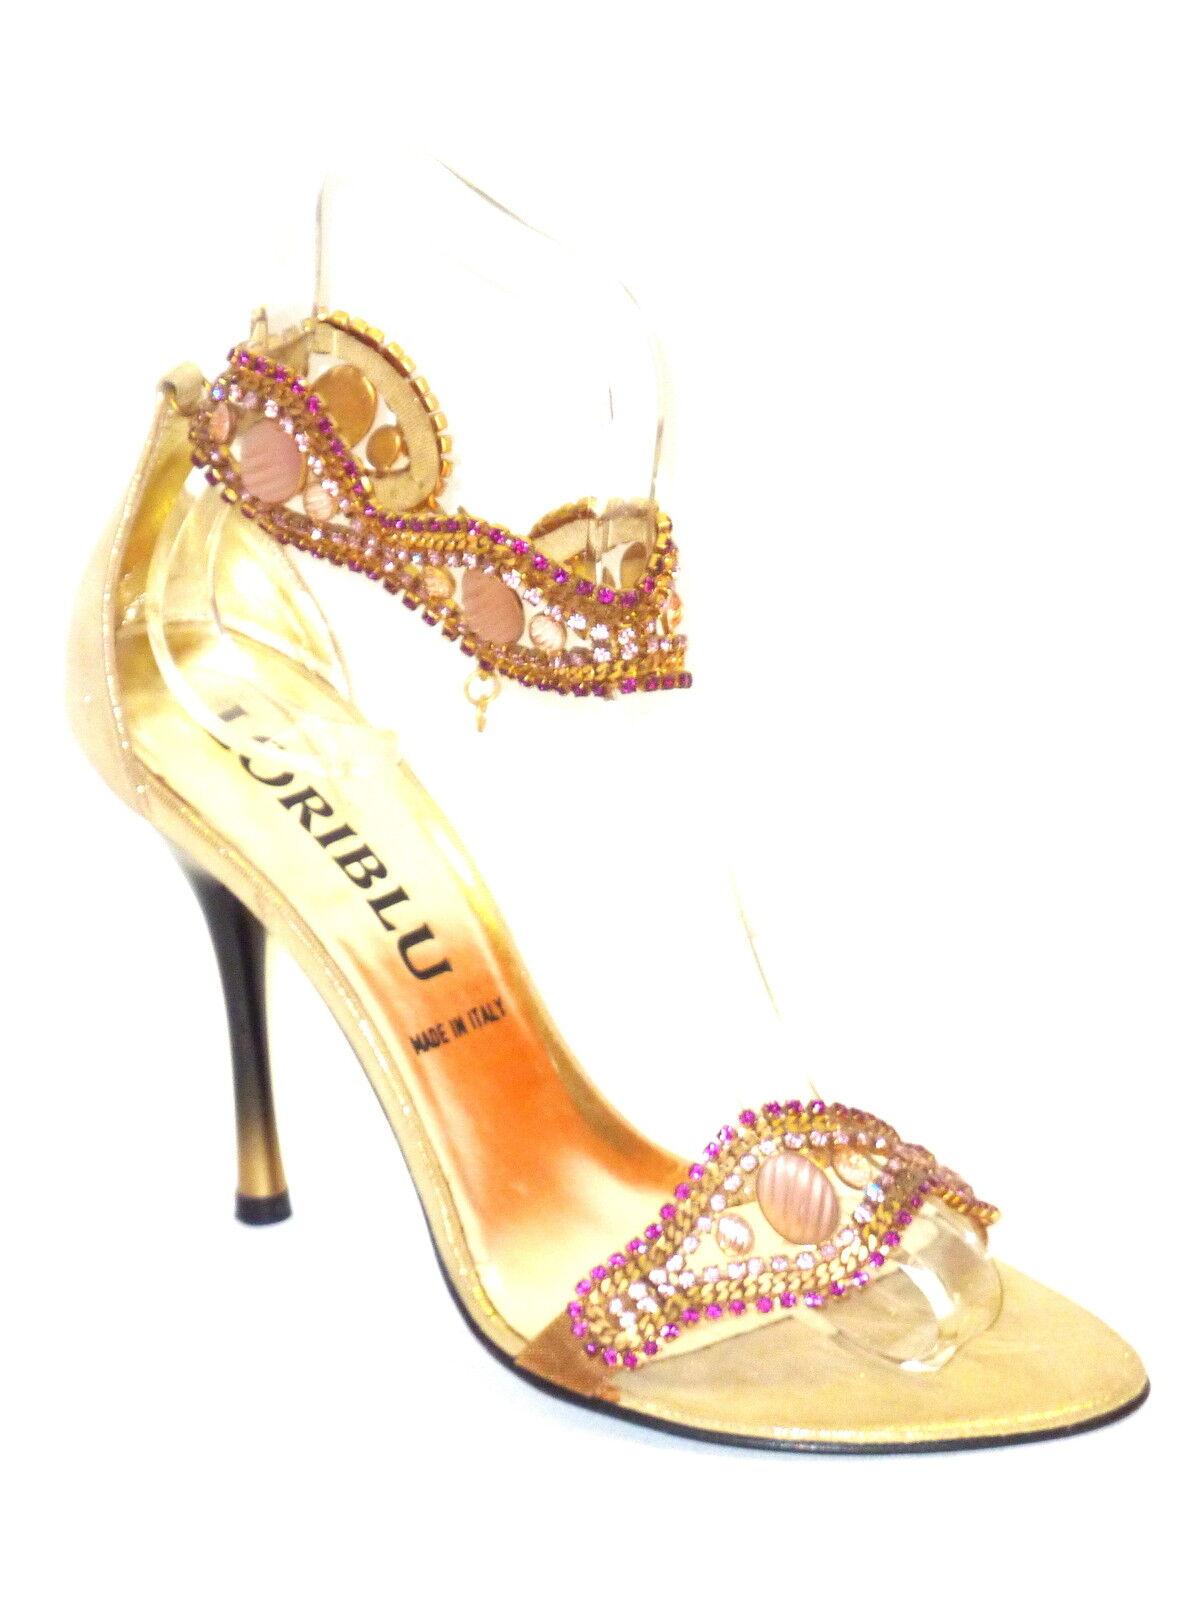 974  LORIblue SANDALI GIOIELLO women gold-SWAROVSKI  40